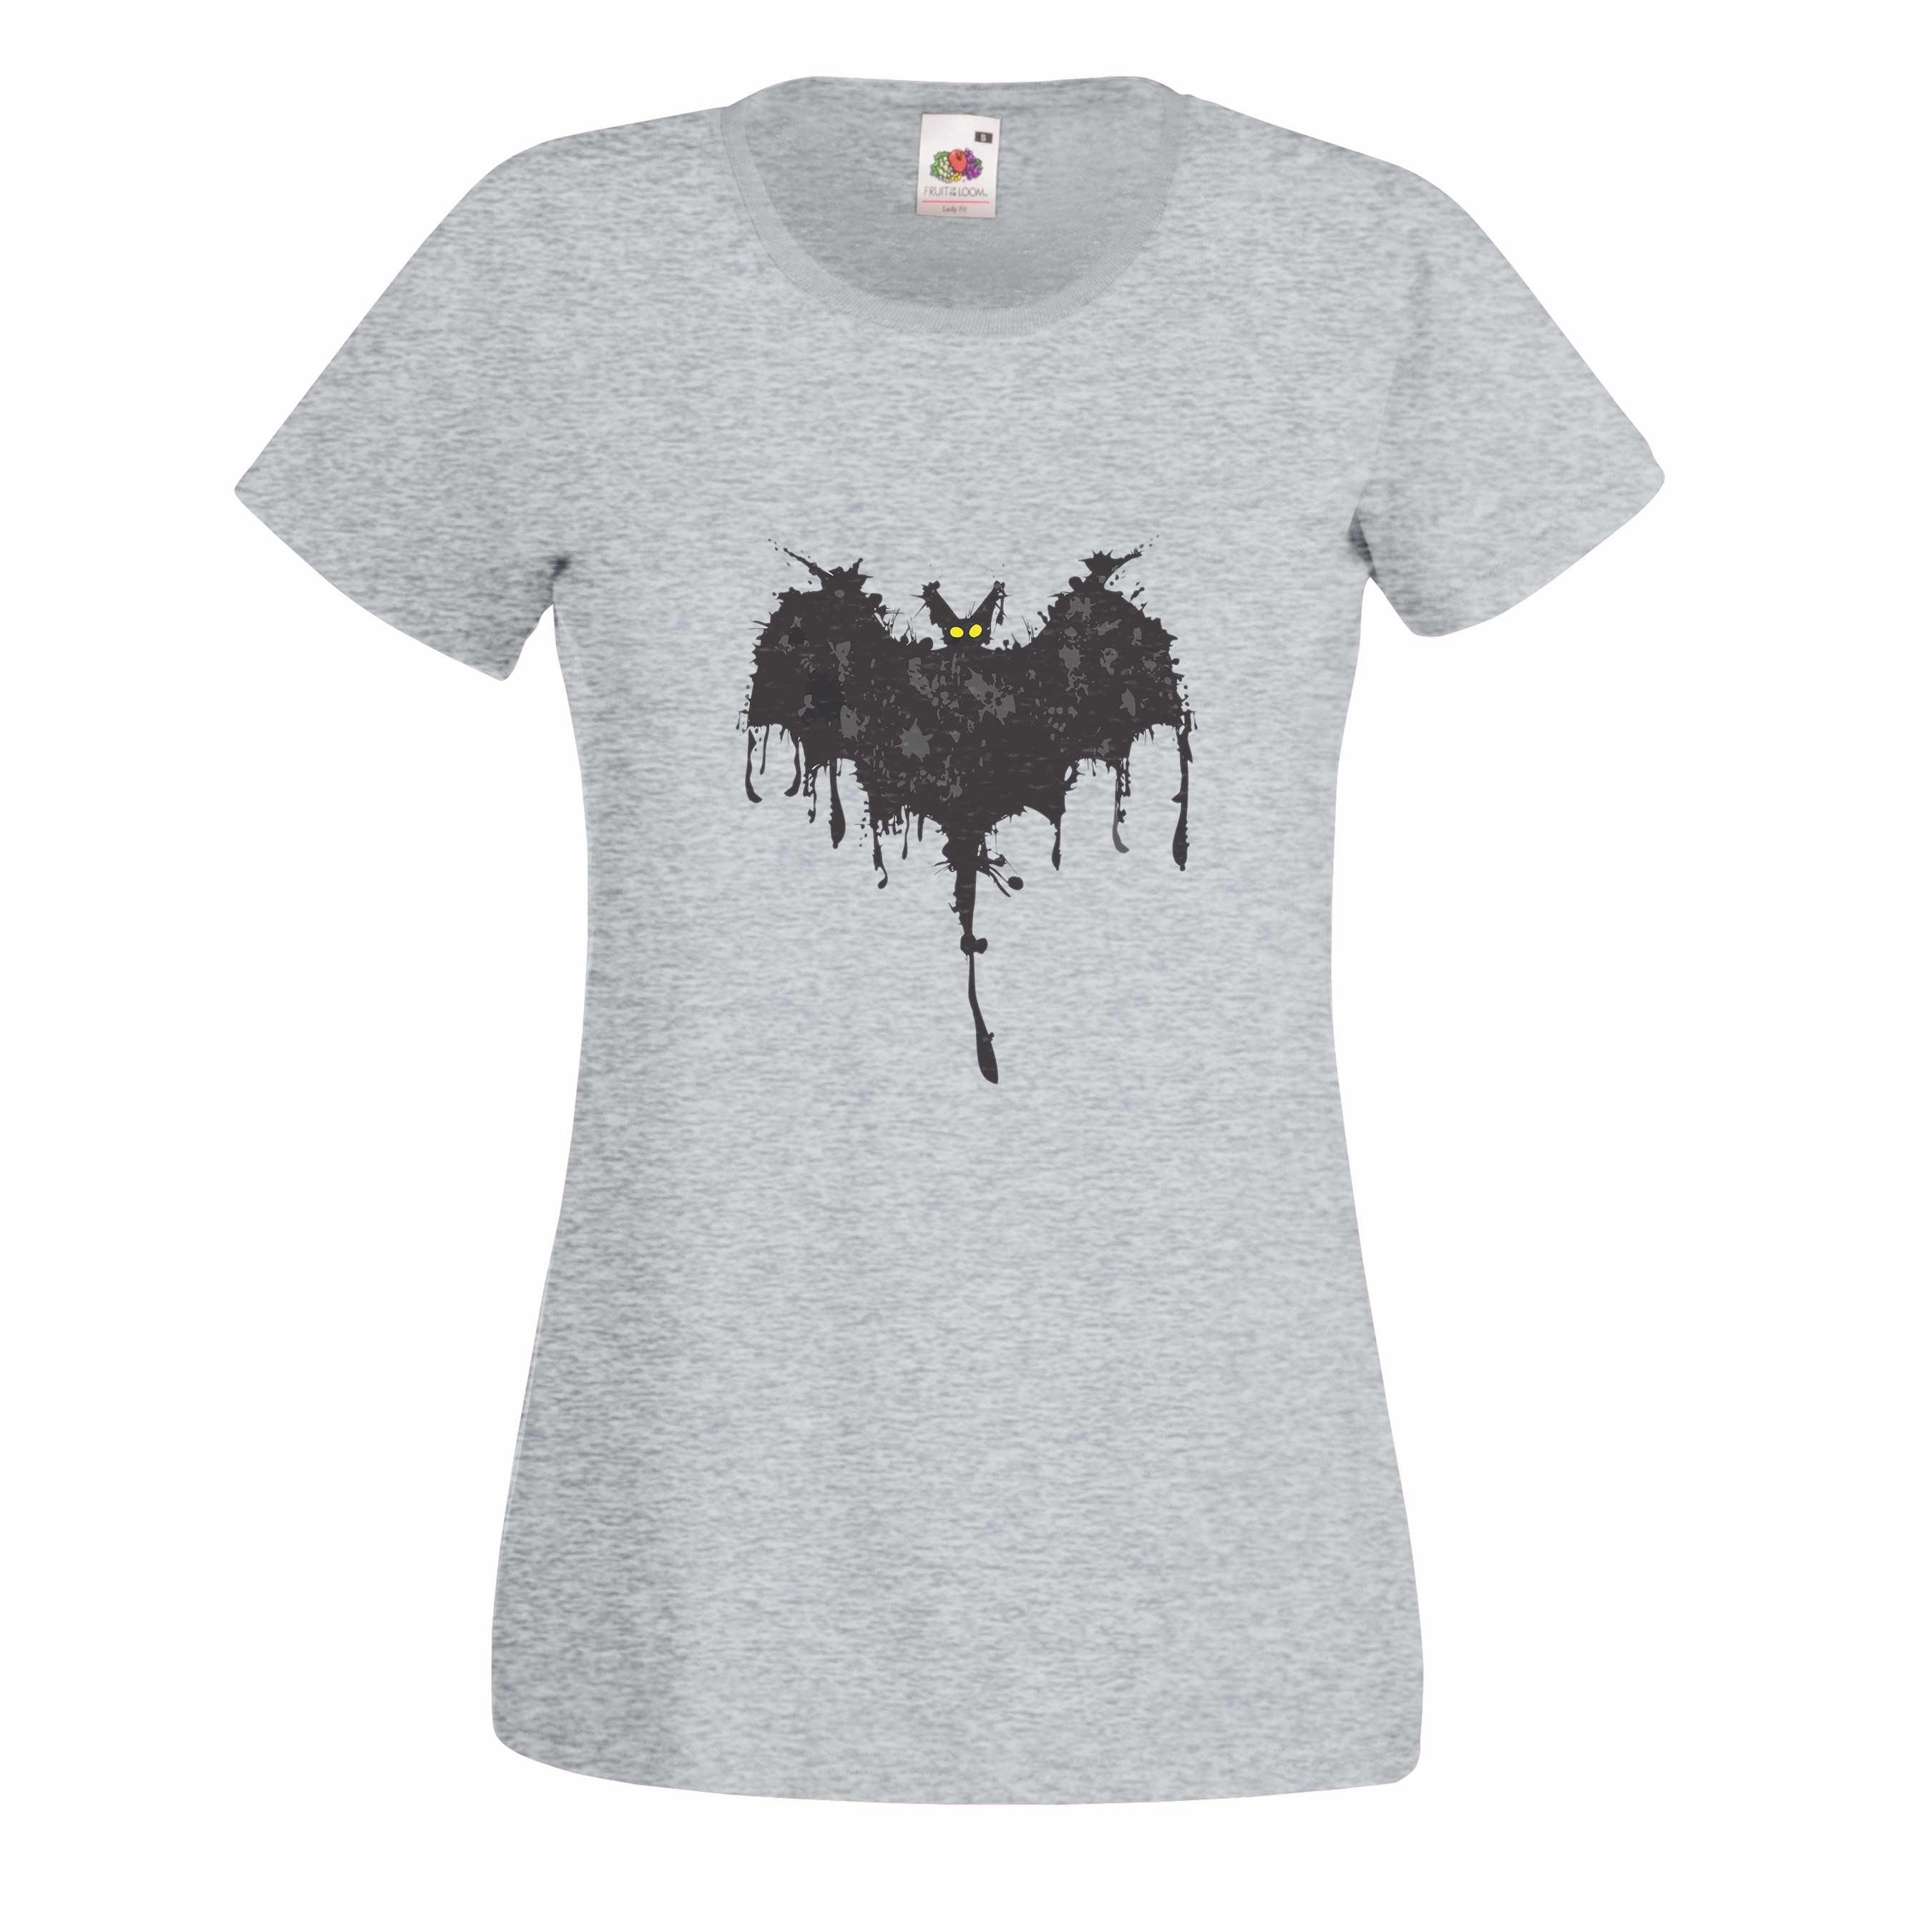 Scary Bat design for t-shirt, hoodie & sweatshirt